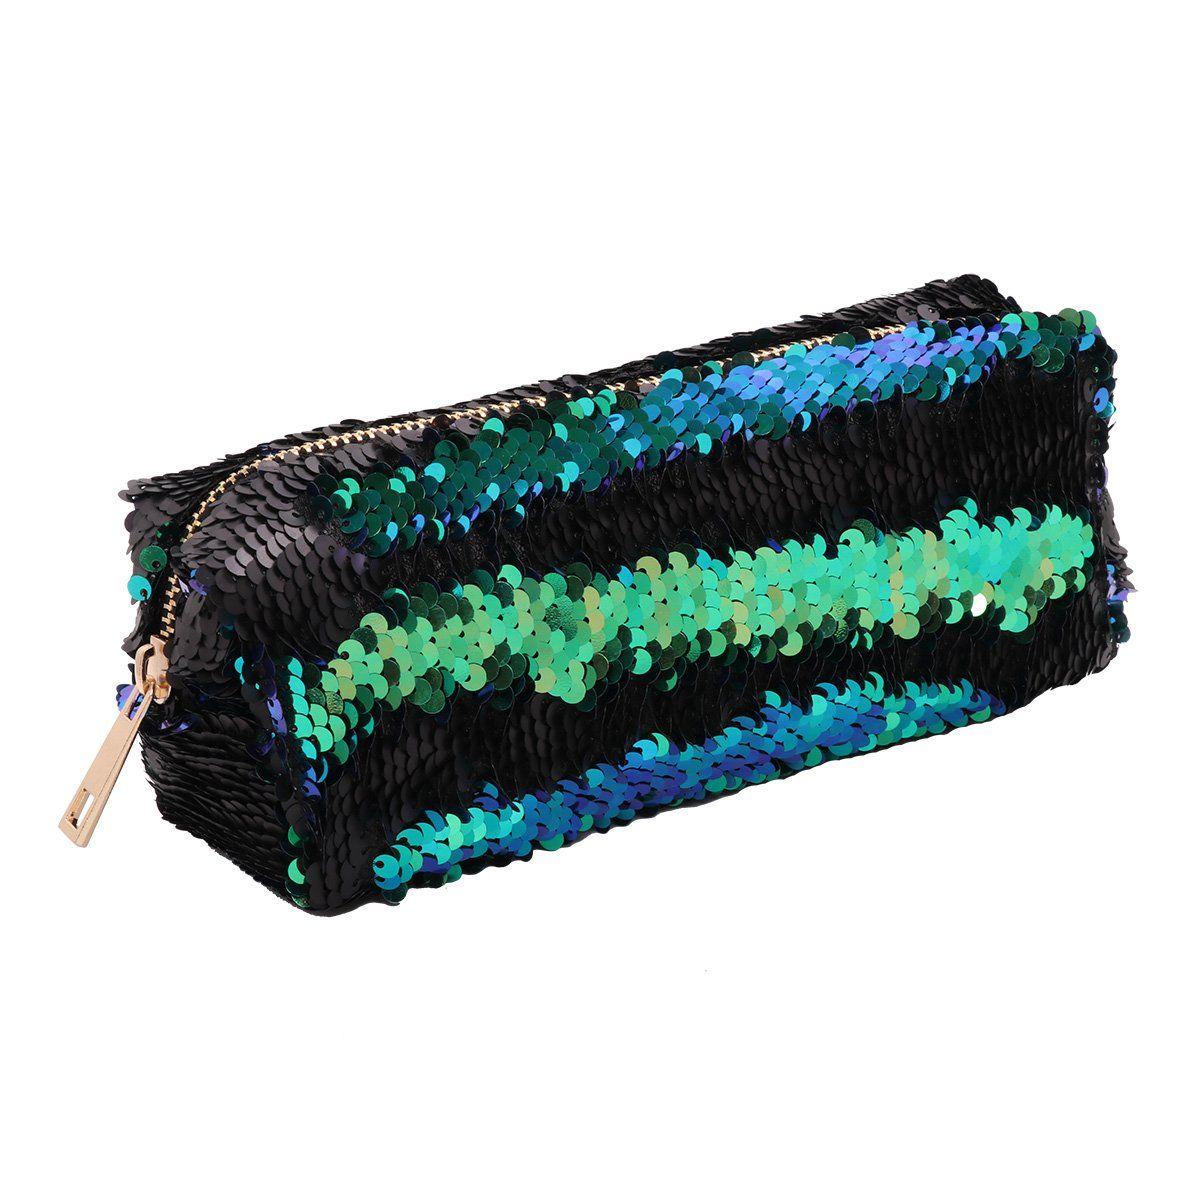 YiZYiF Magic Mermaid Sequin Cosmetic Pouch Girls Glitter